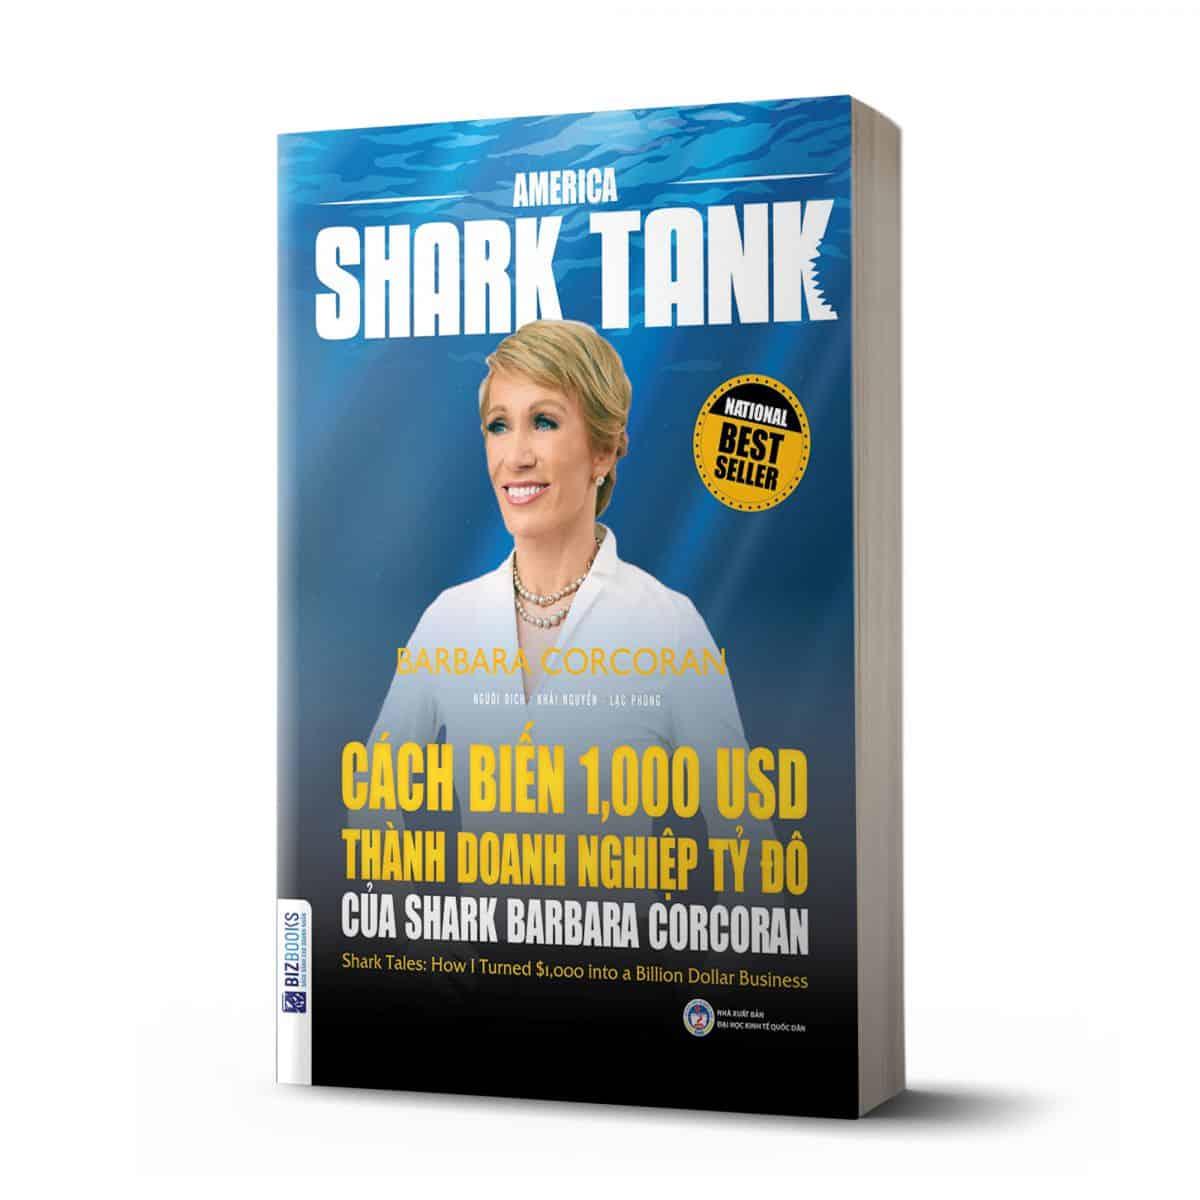 america shark tank cach bien 1000 usd thanh doanh nghiep ty do cua shark Barbara corcoran